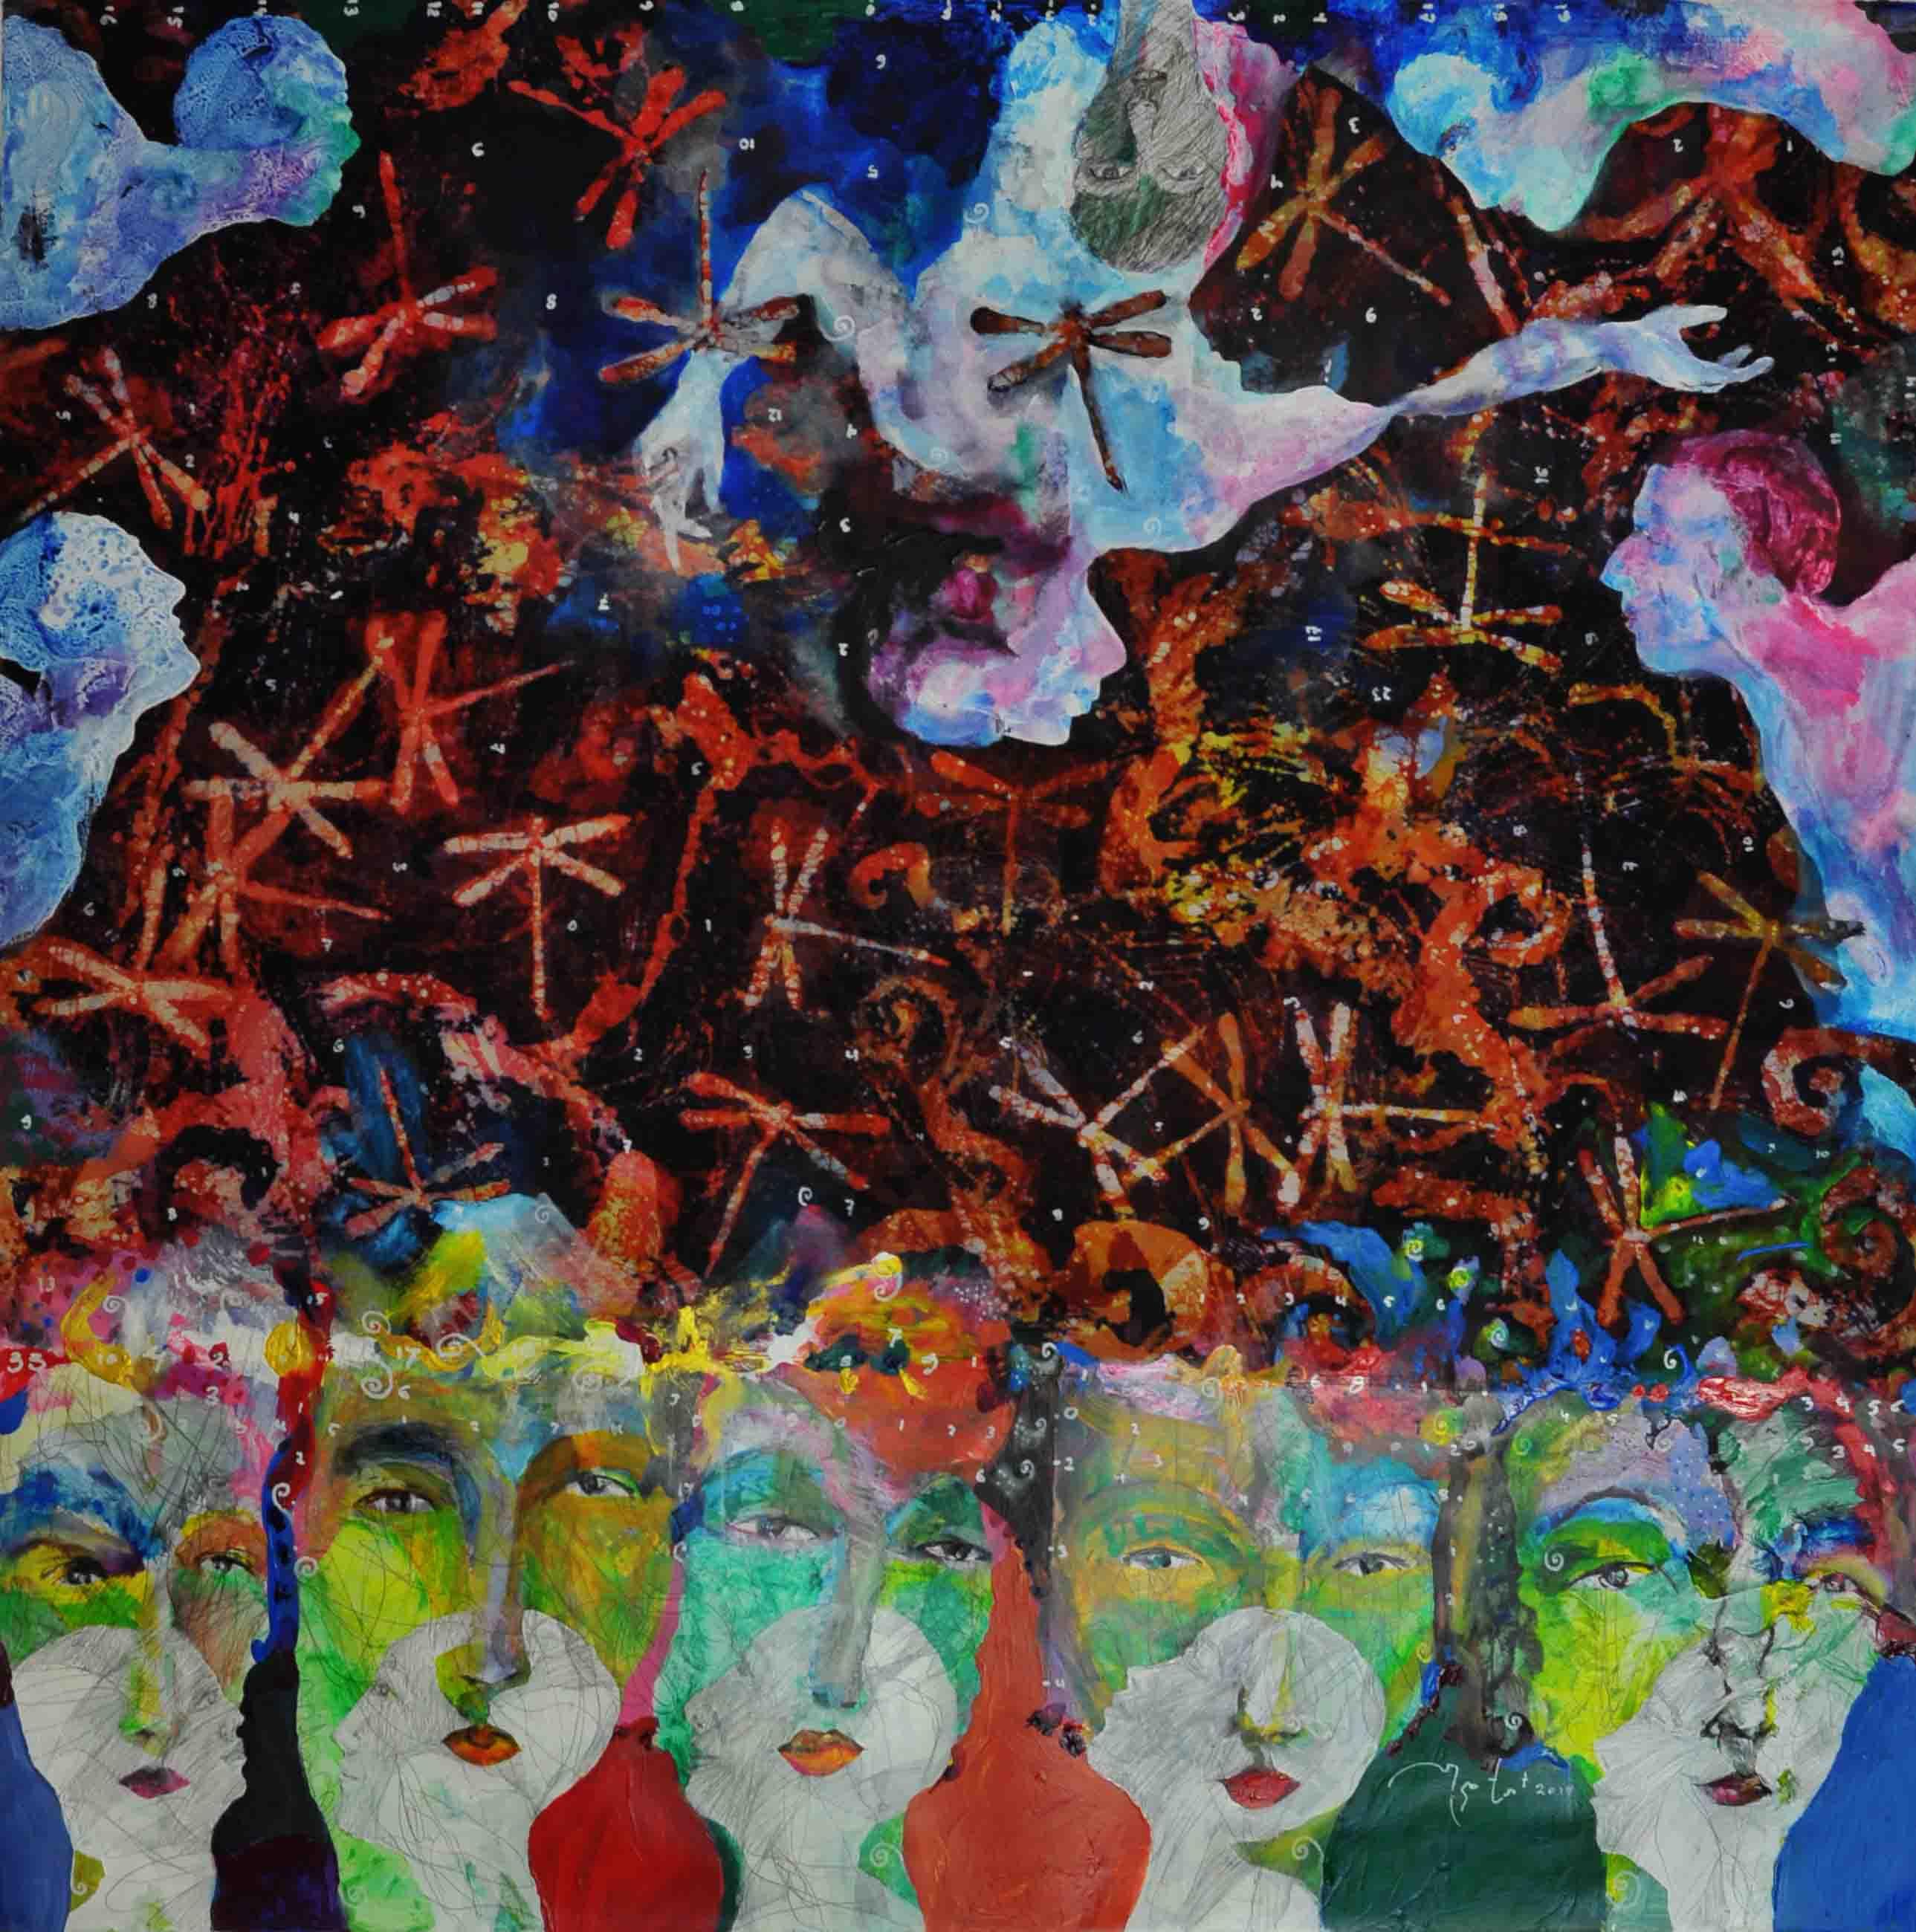 Reincarnation 2 | Gatot Widodo | Abo Gallery